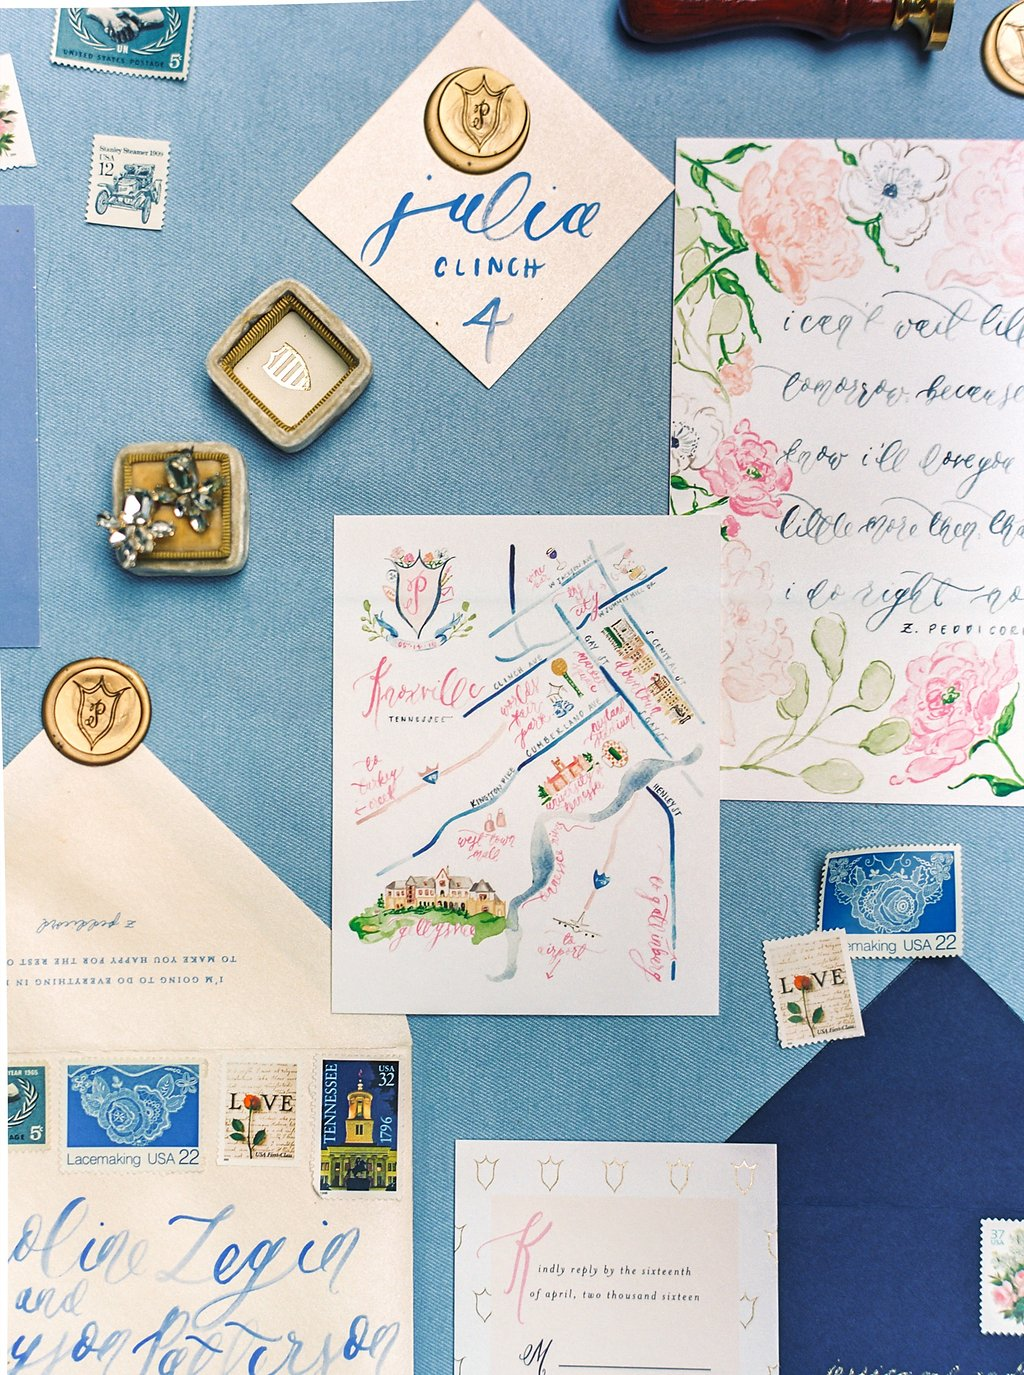 comparing wedding postage options standard usps postage custom postage and vintage postage stamps stamps for wedding invitations Vintage Postage Stamps by Verde Studio Comparing Wedding Postage Options Standard USPS Postage